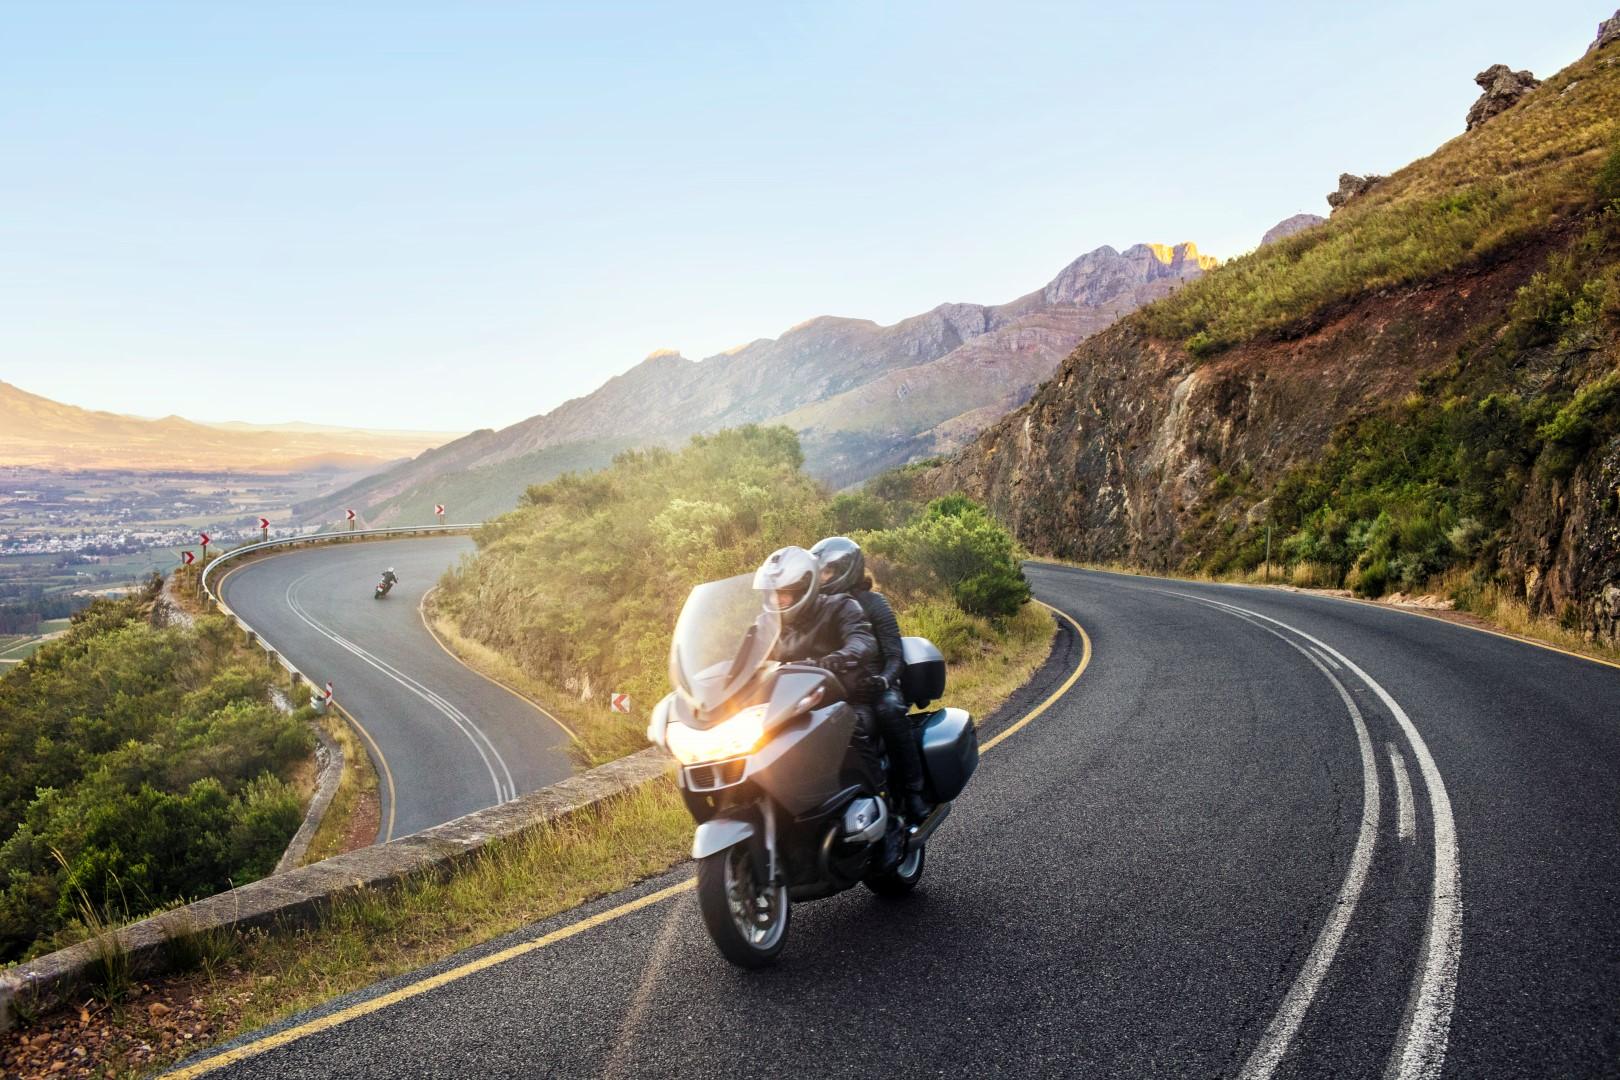 Descubre tu próxima aventura en moto